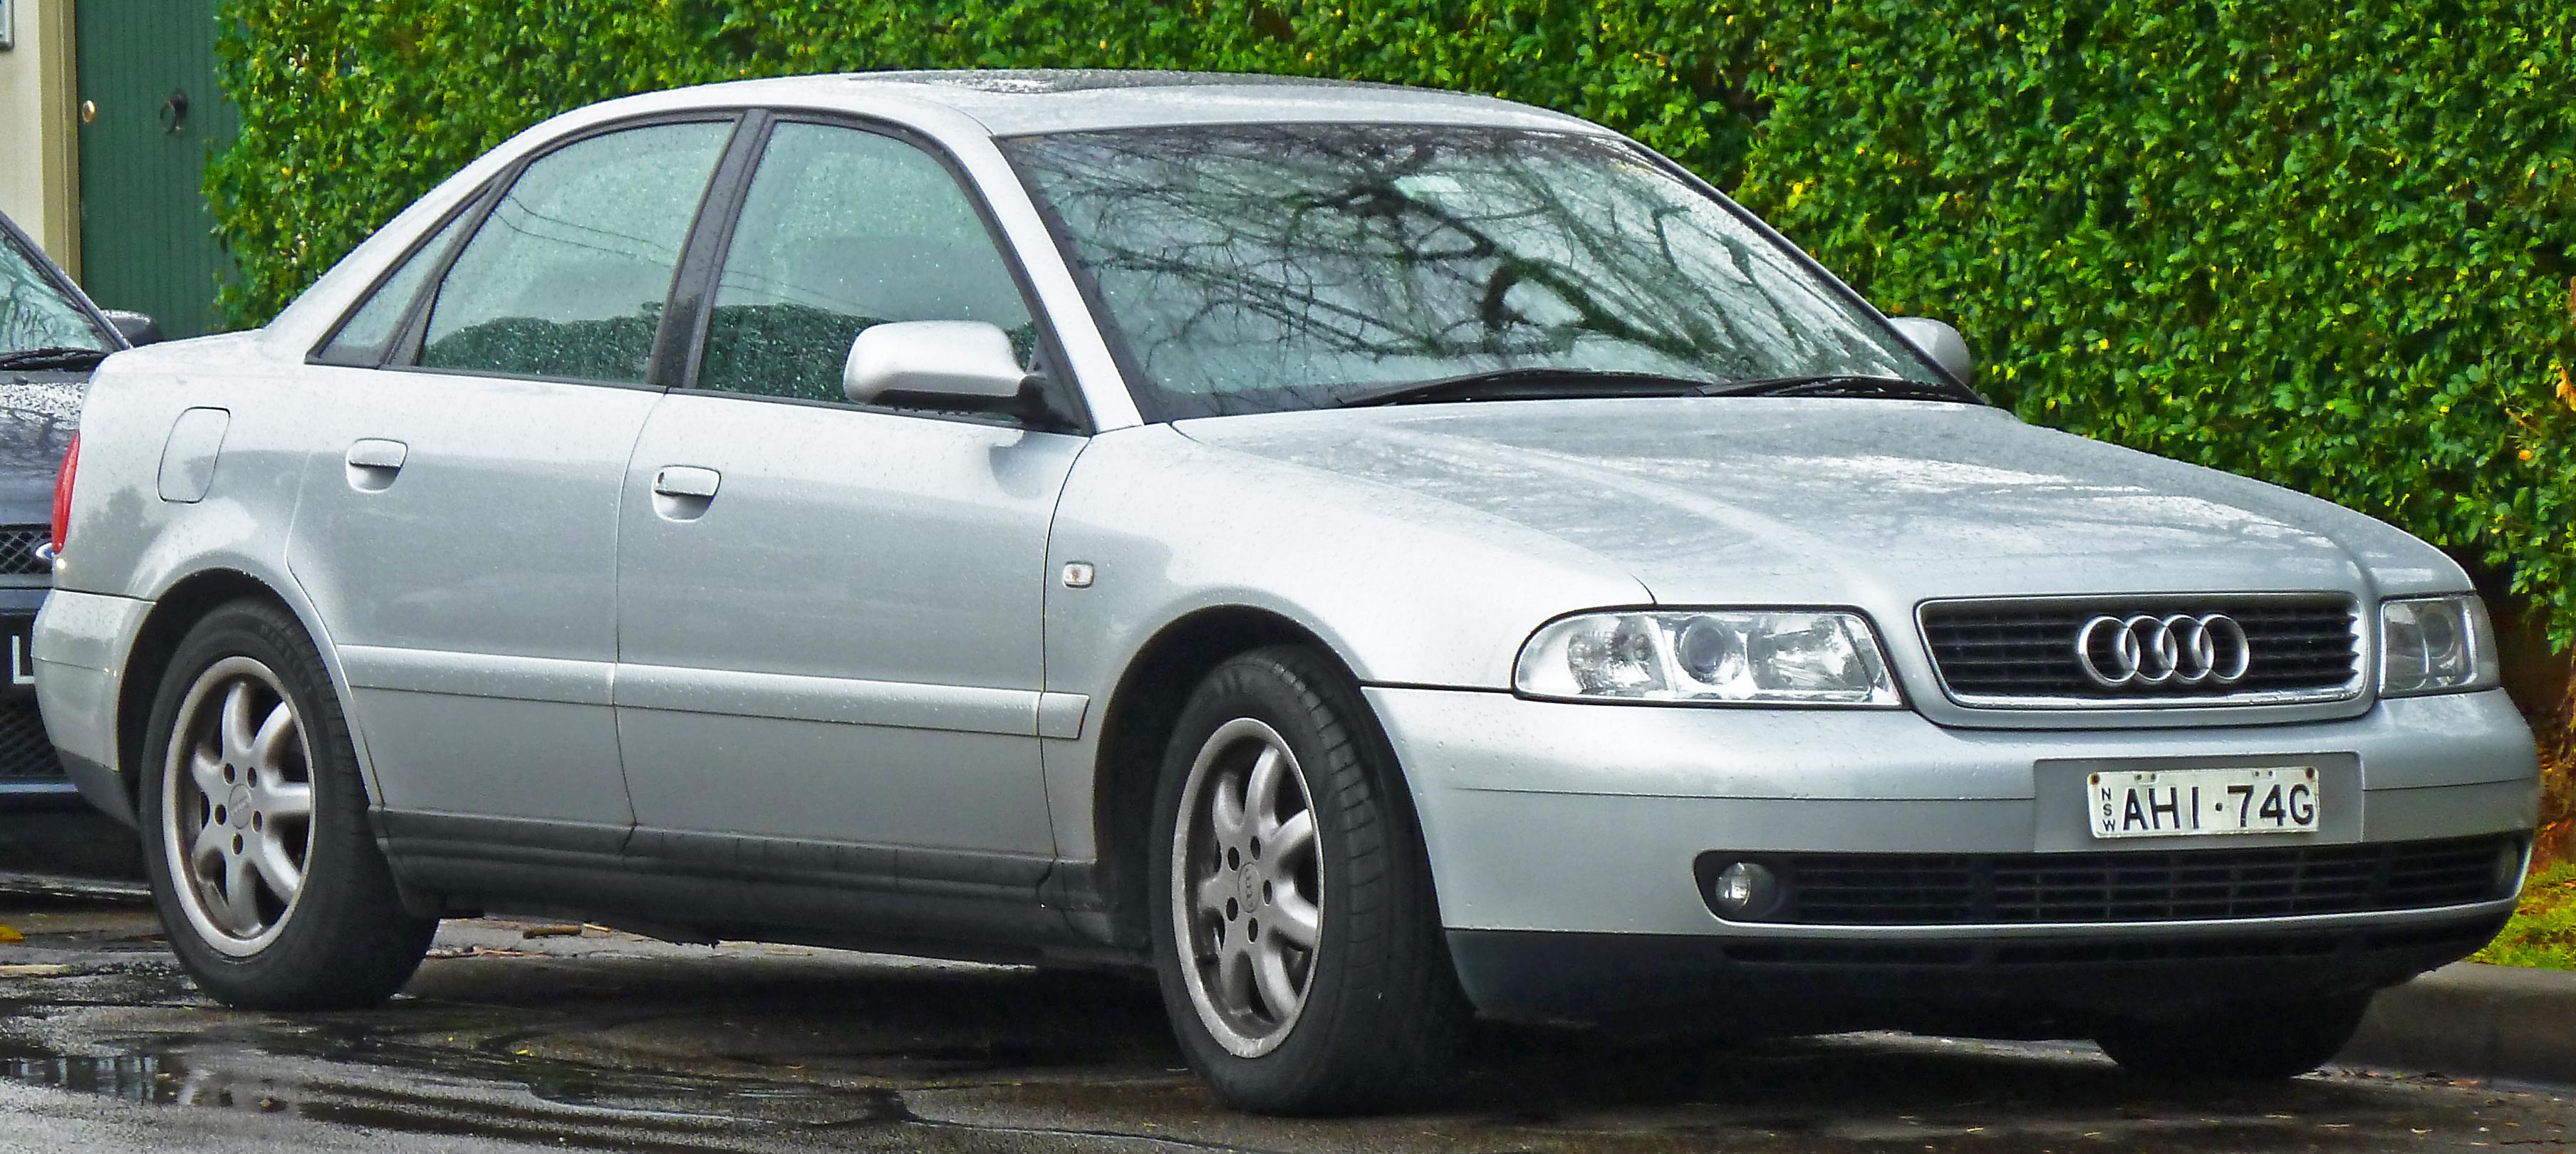 1999 Audi A4 Image 17